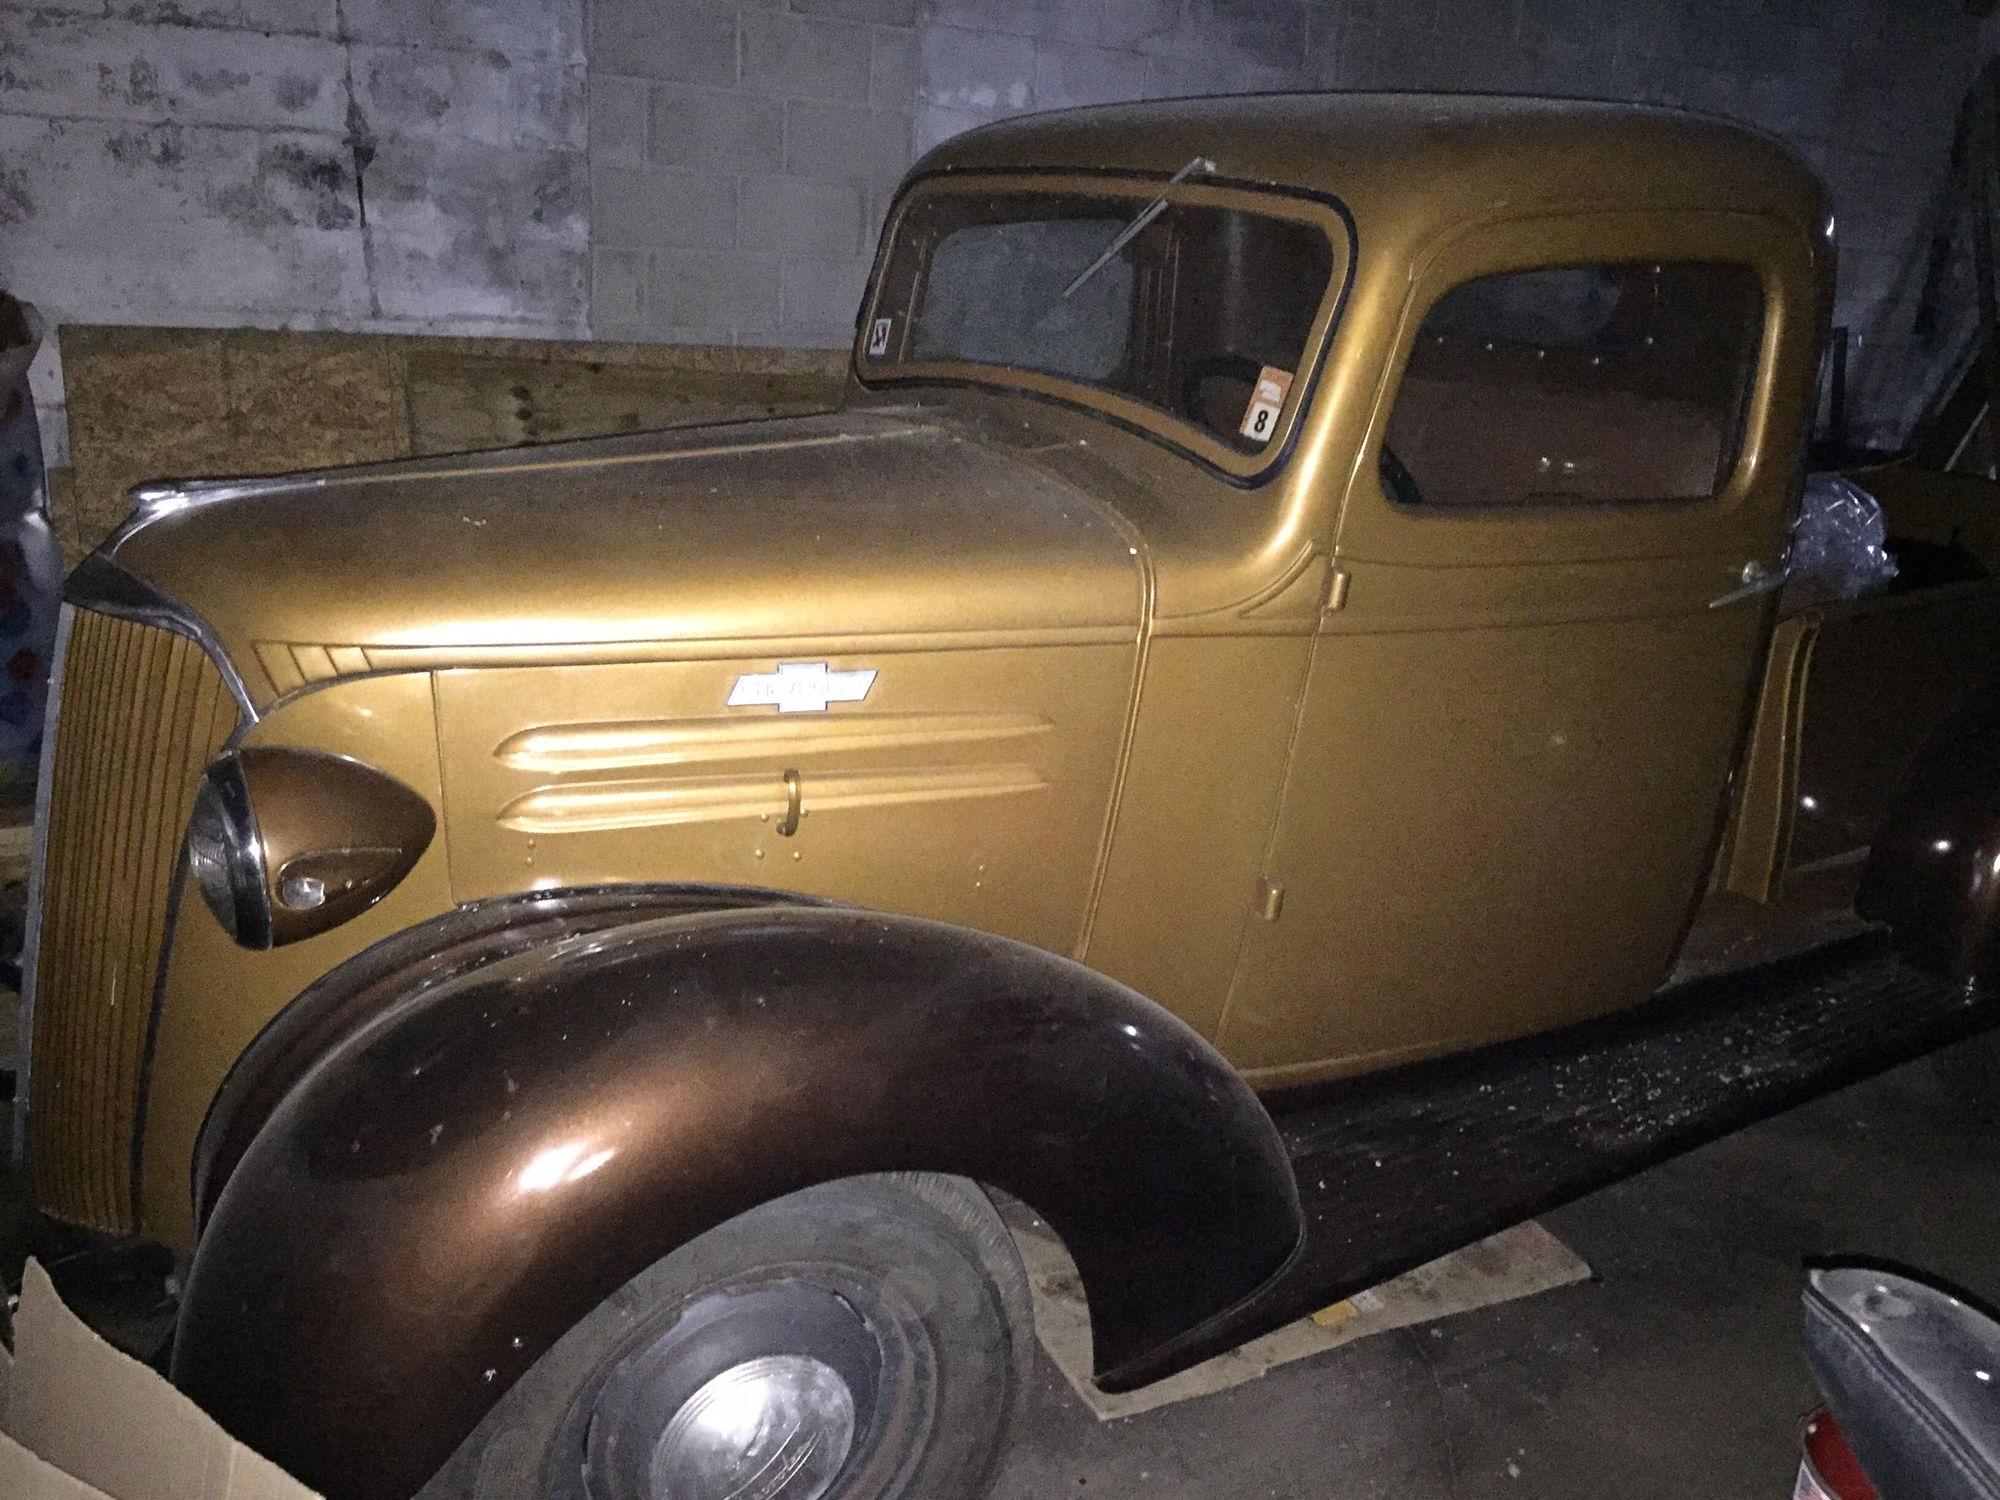 For Sale 1937 chevy 1/2 ton truck stock - CorvetteForum - Chevrolet ...